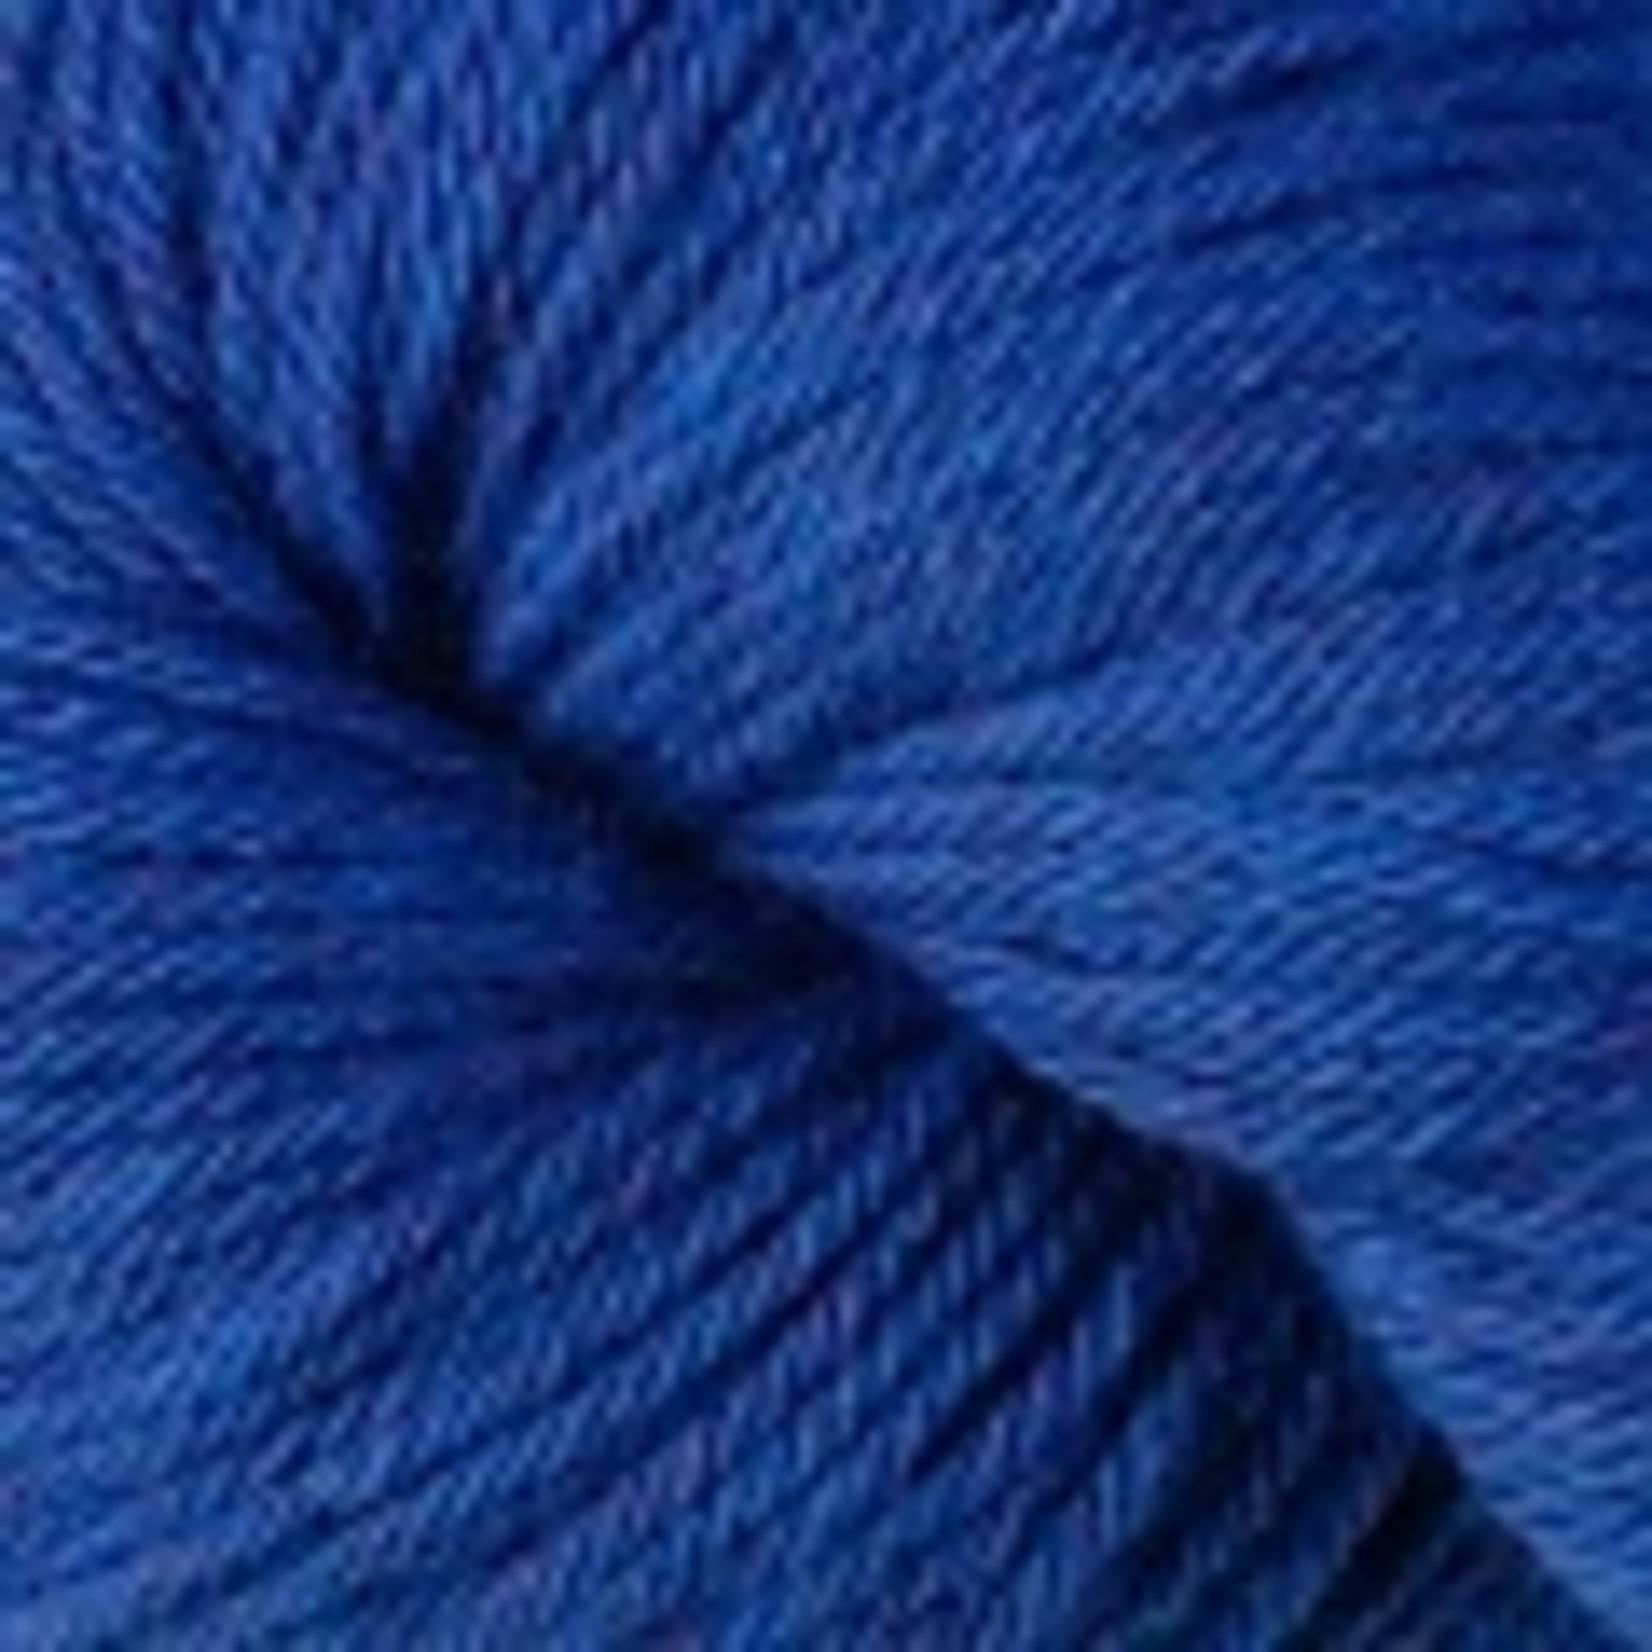 Berroco Vintage Wool, 51191, Blue Moon